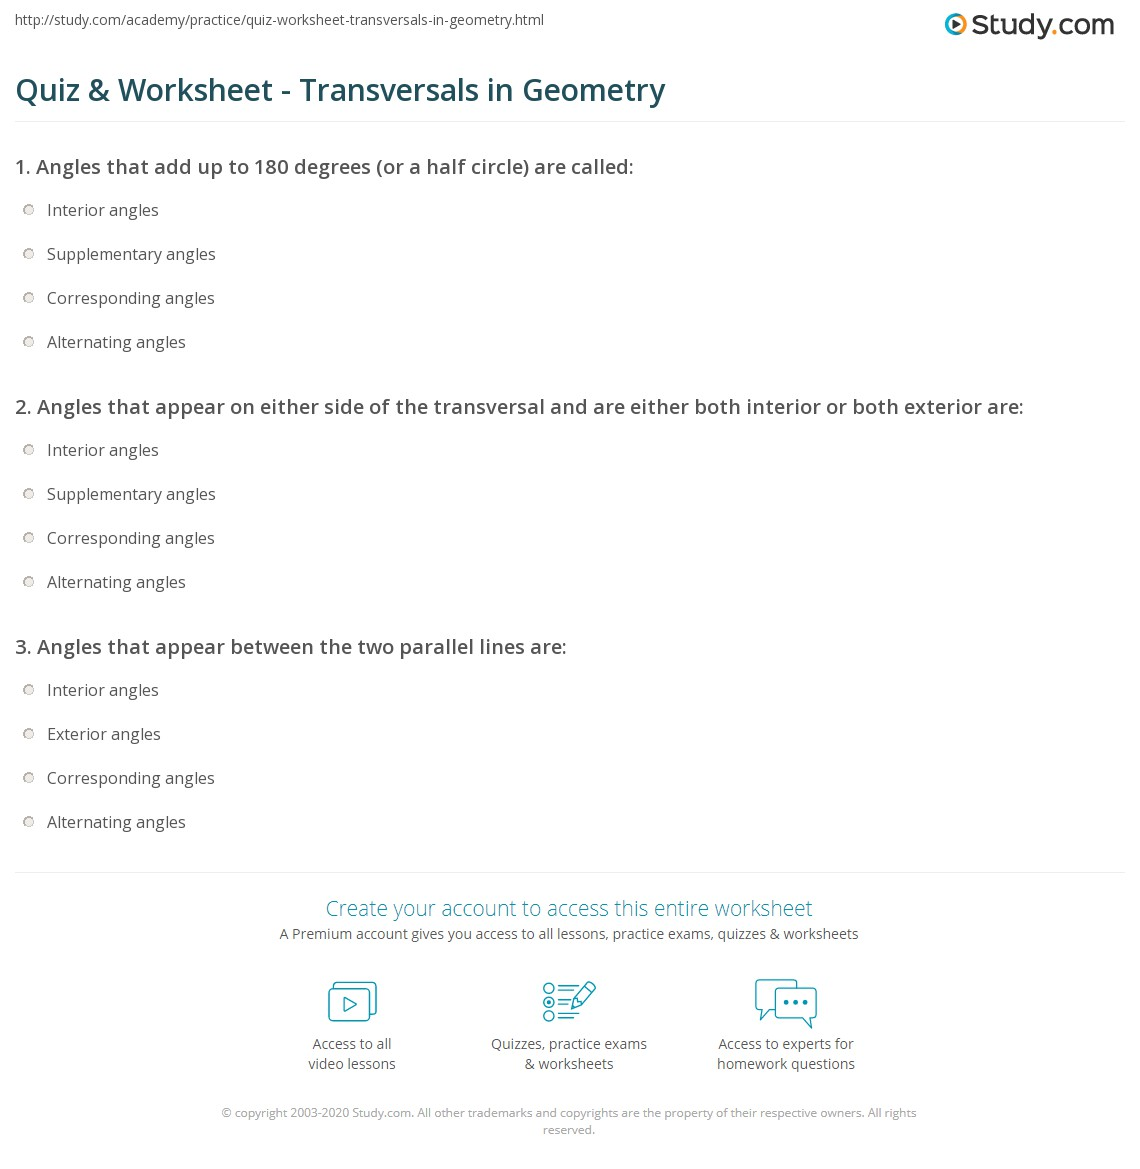 Quiz Worksheet Transversals in Geometry – Transversals Worksheet